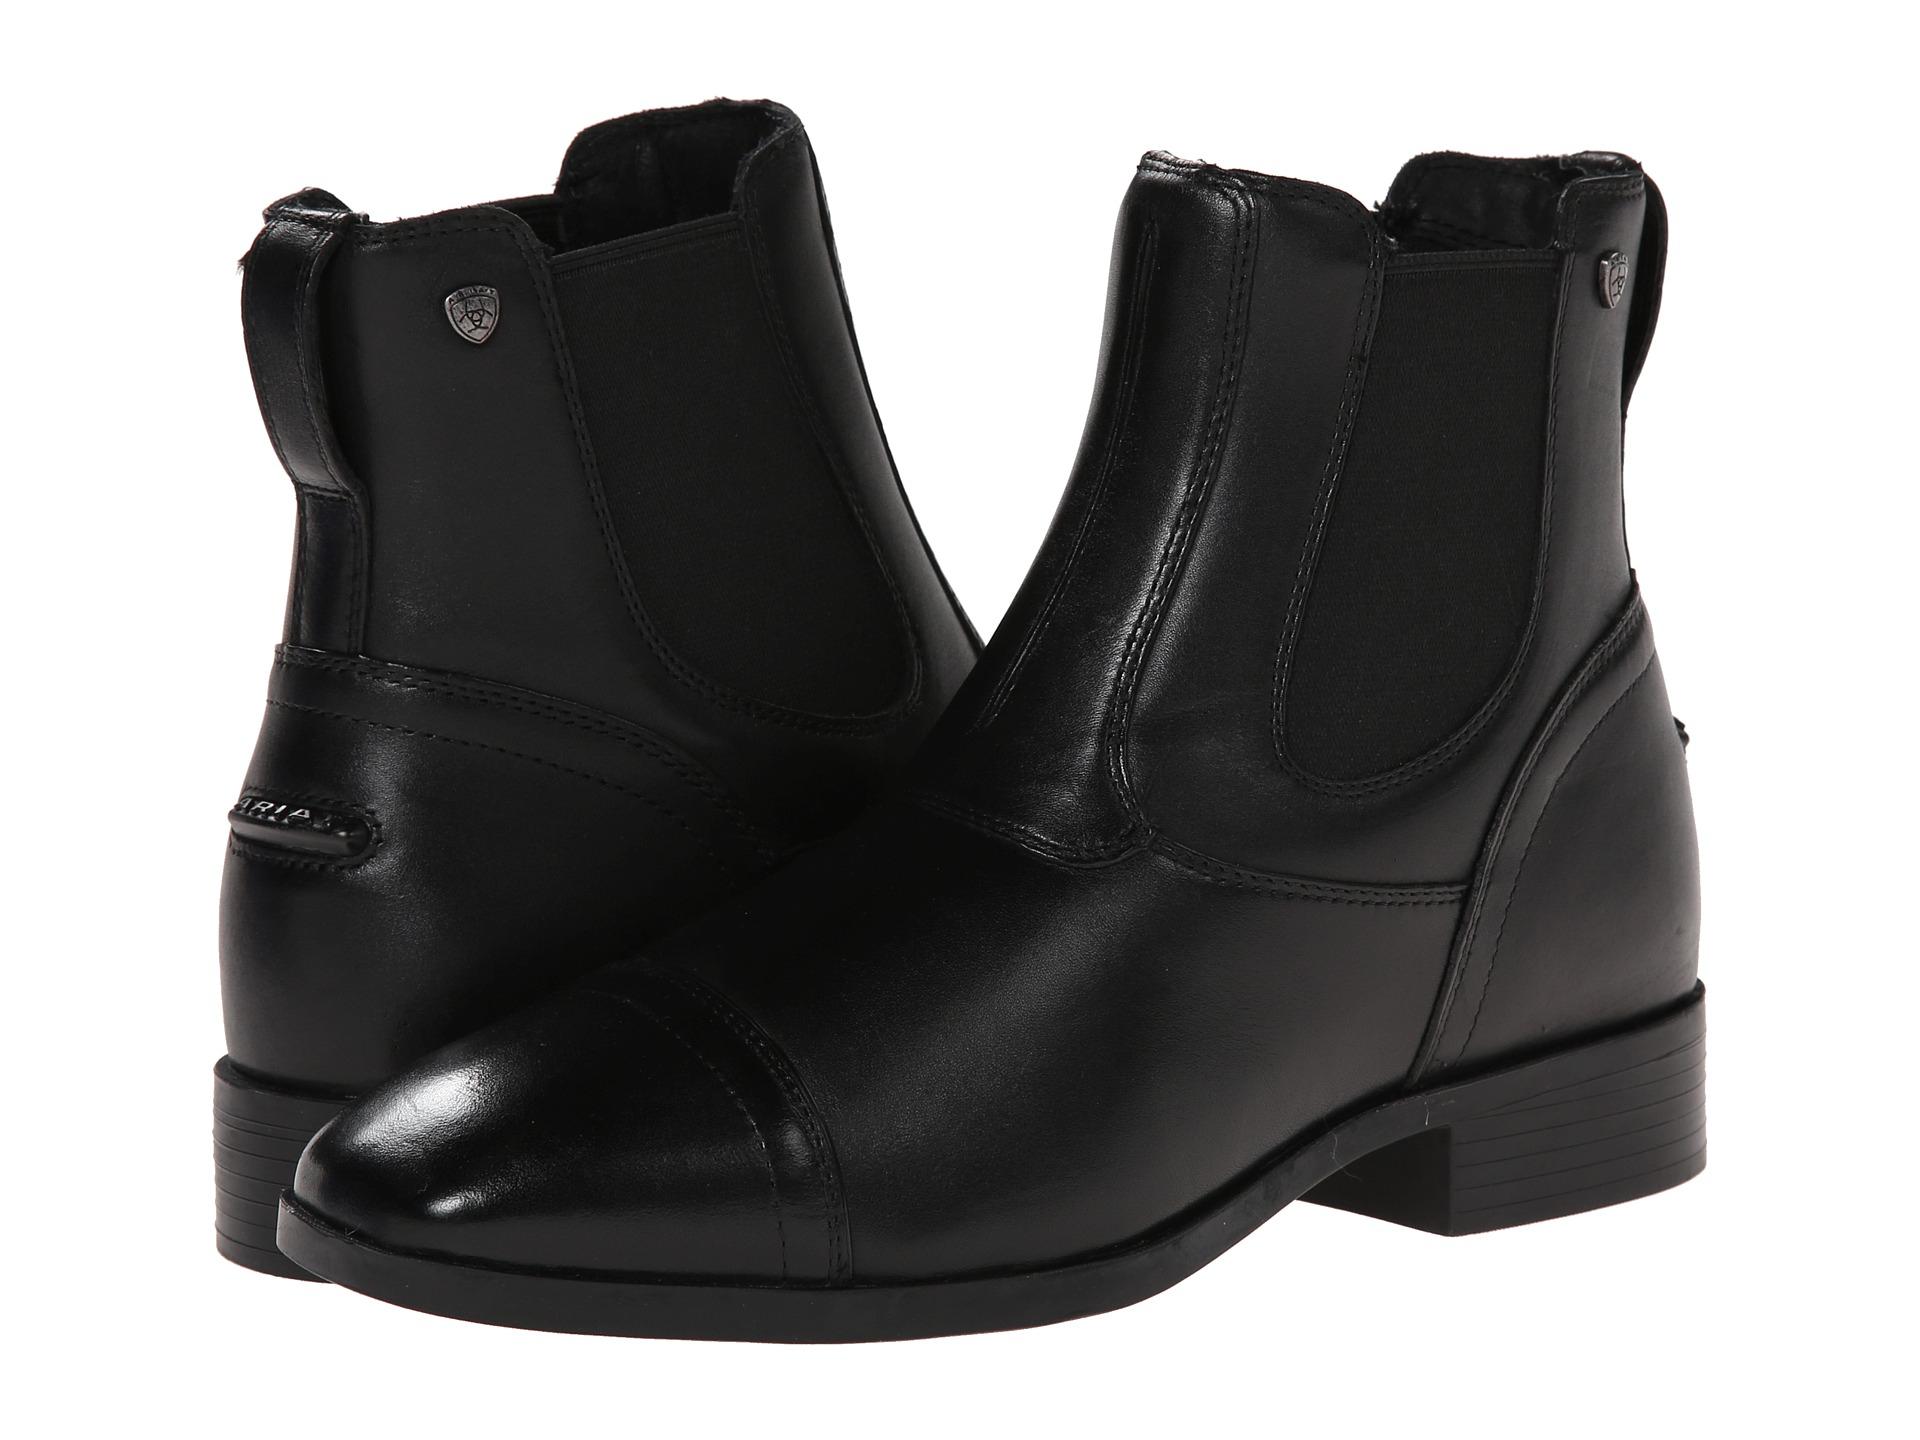 Lyst Ariat Challenge Square Toe Dress Paddock In Black